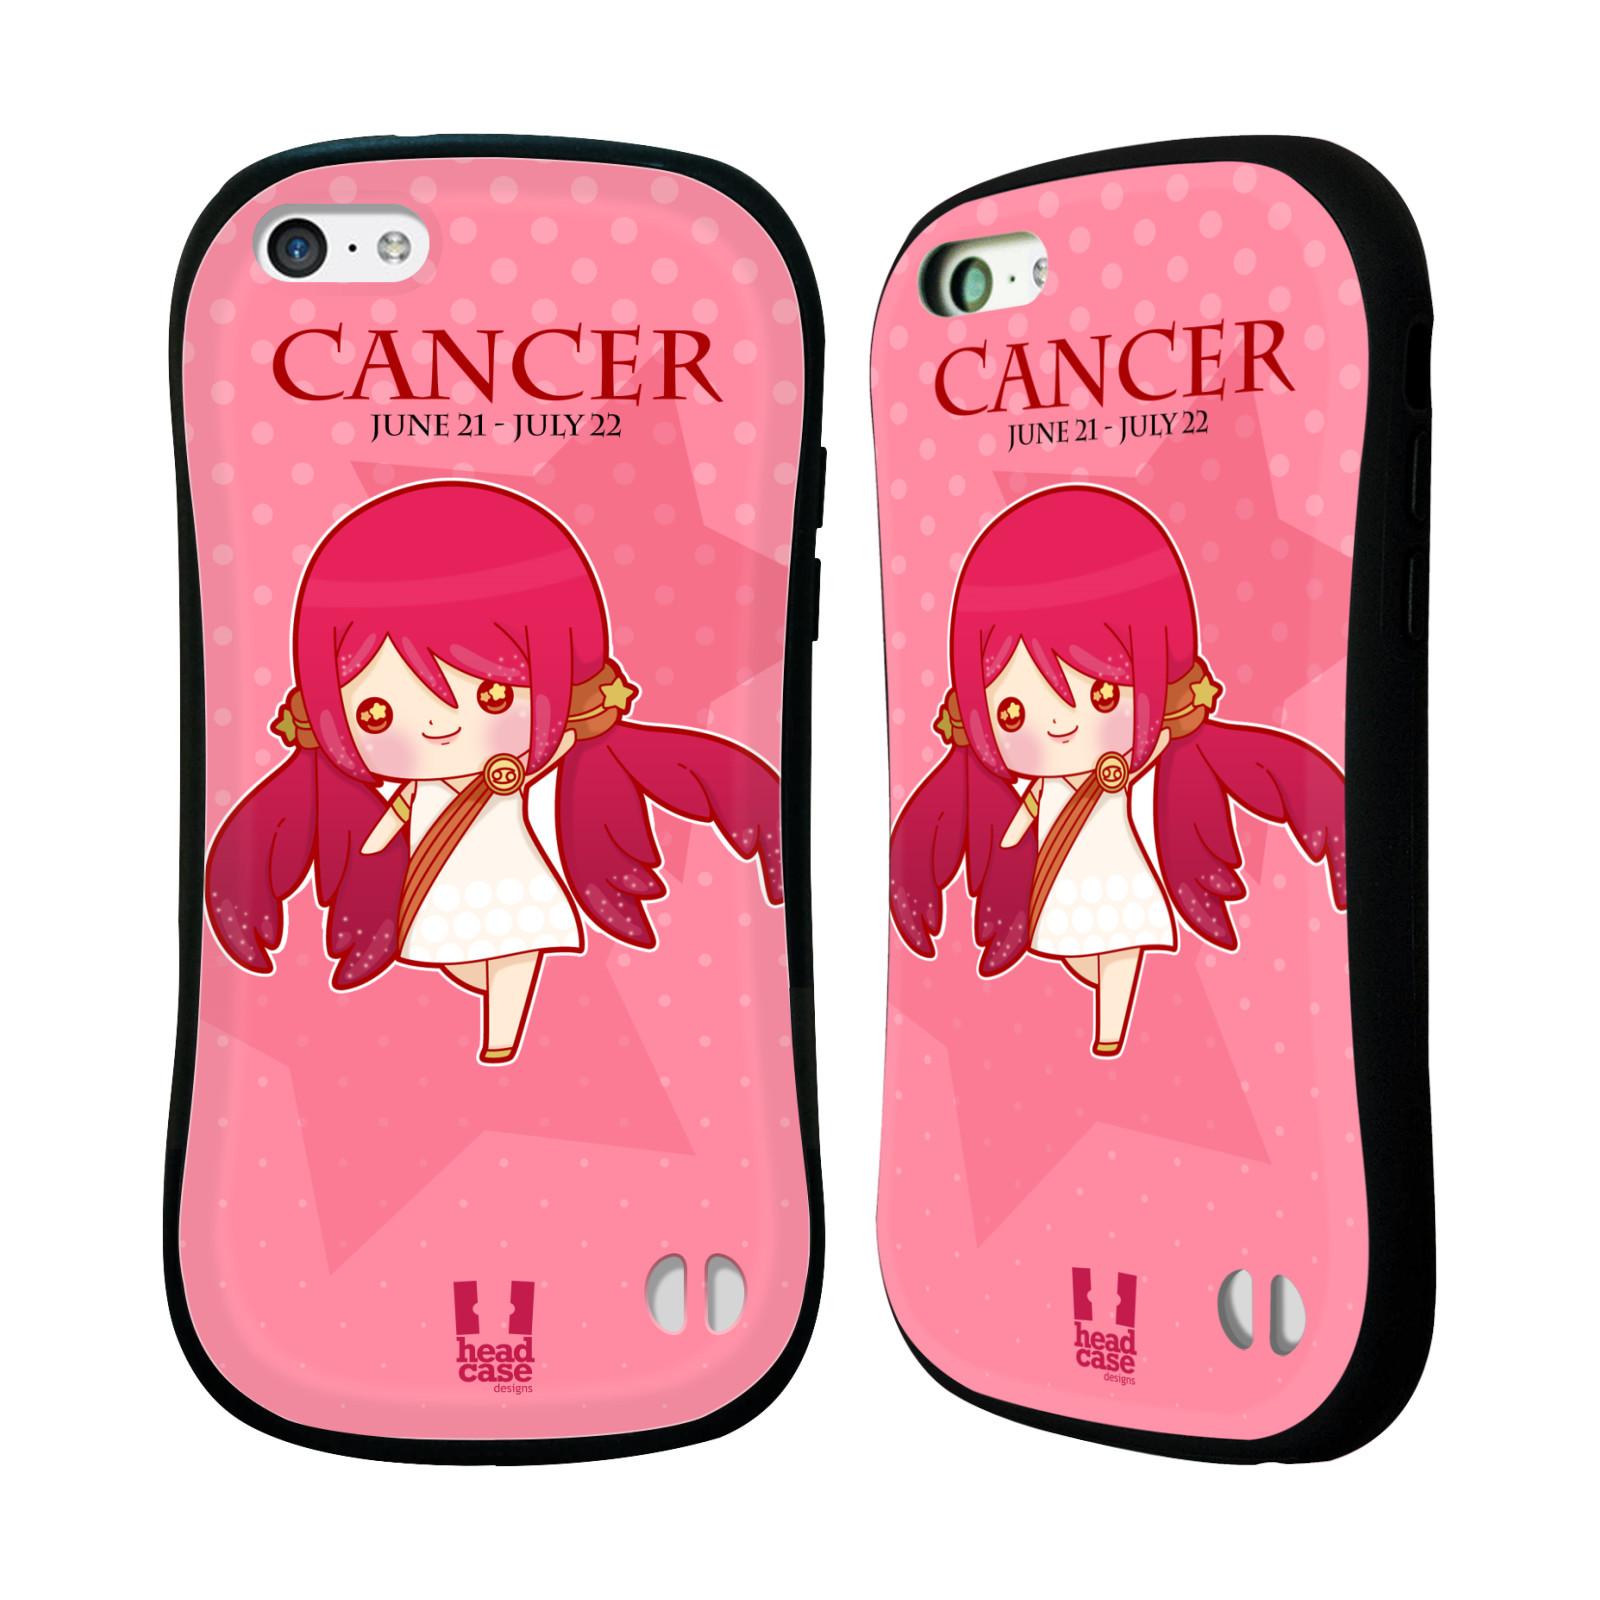 HEAD-CASE-DESIGNS-KAWAII-ZODIAC-SIGNS-HYBRID-GEL-BACK-CASE-FOR-APPLE-iPHONE-5C